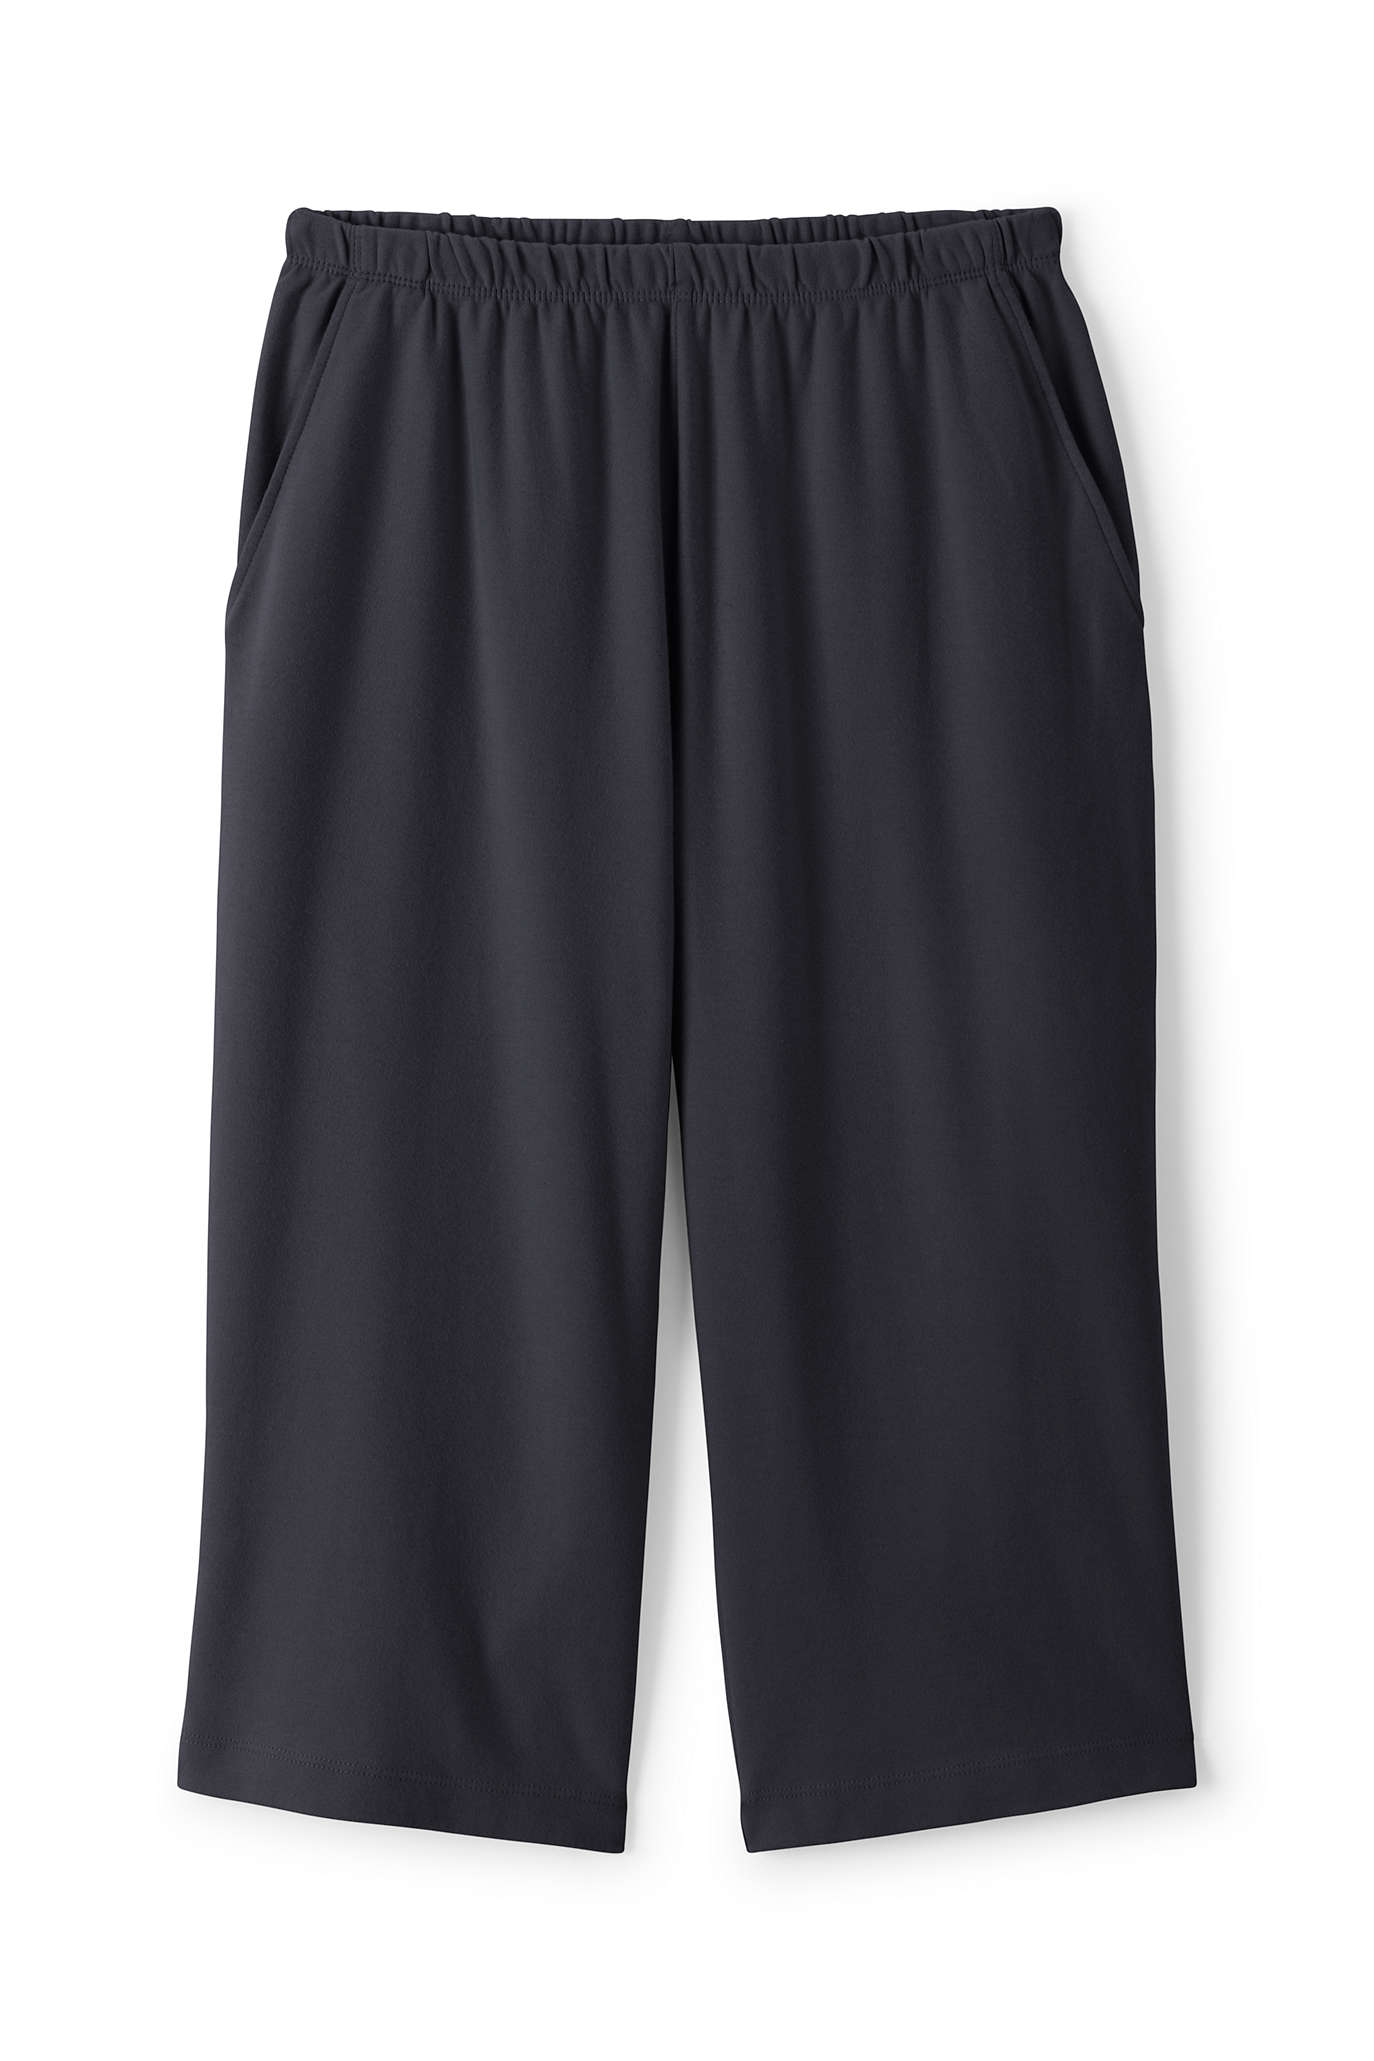 Women's Plus Size Sport Knit Capri